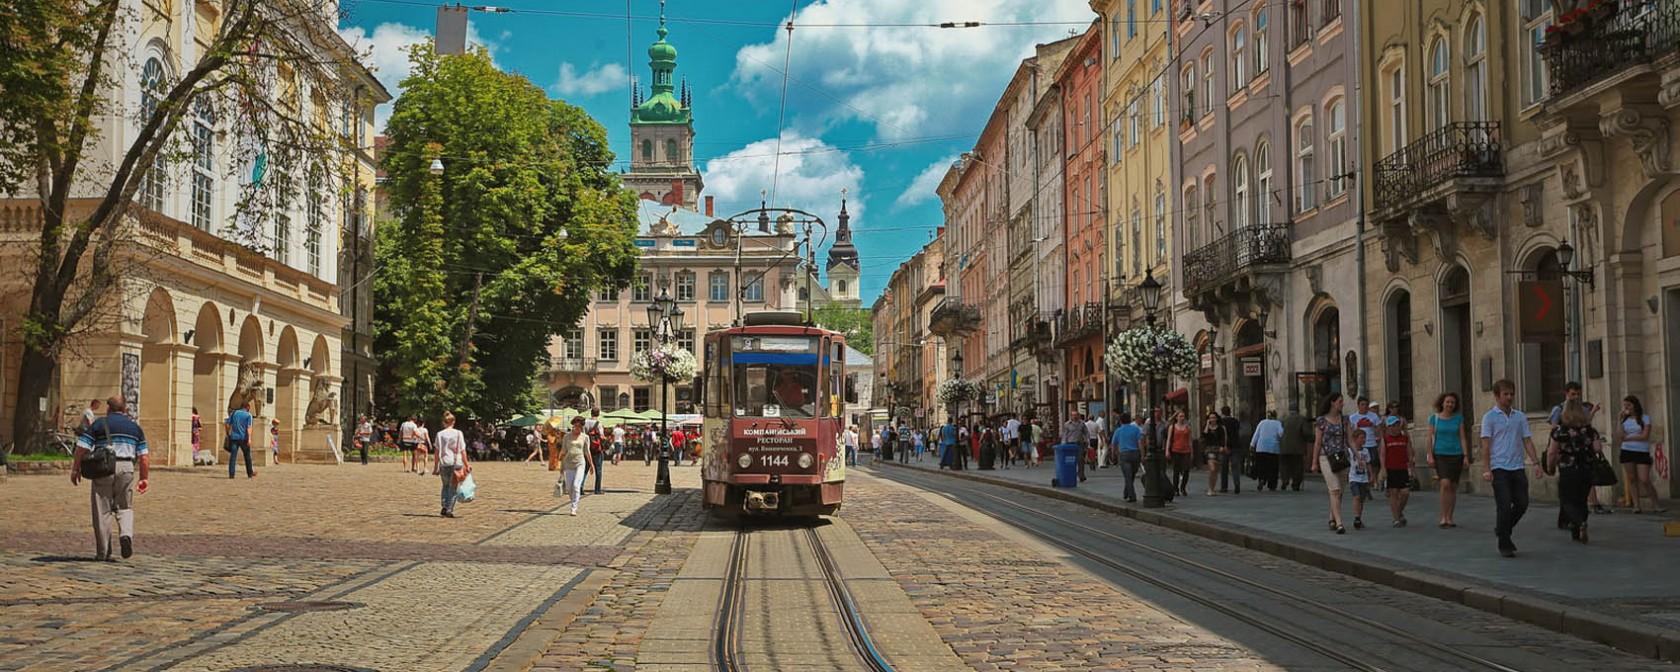 Lviv_ss_851-1680x672.jpg